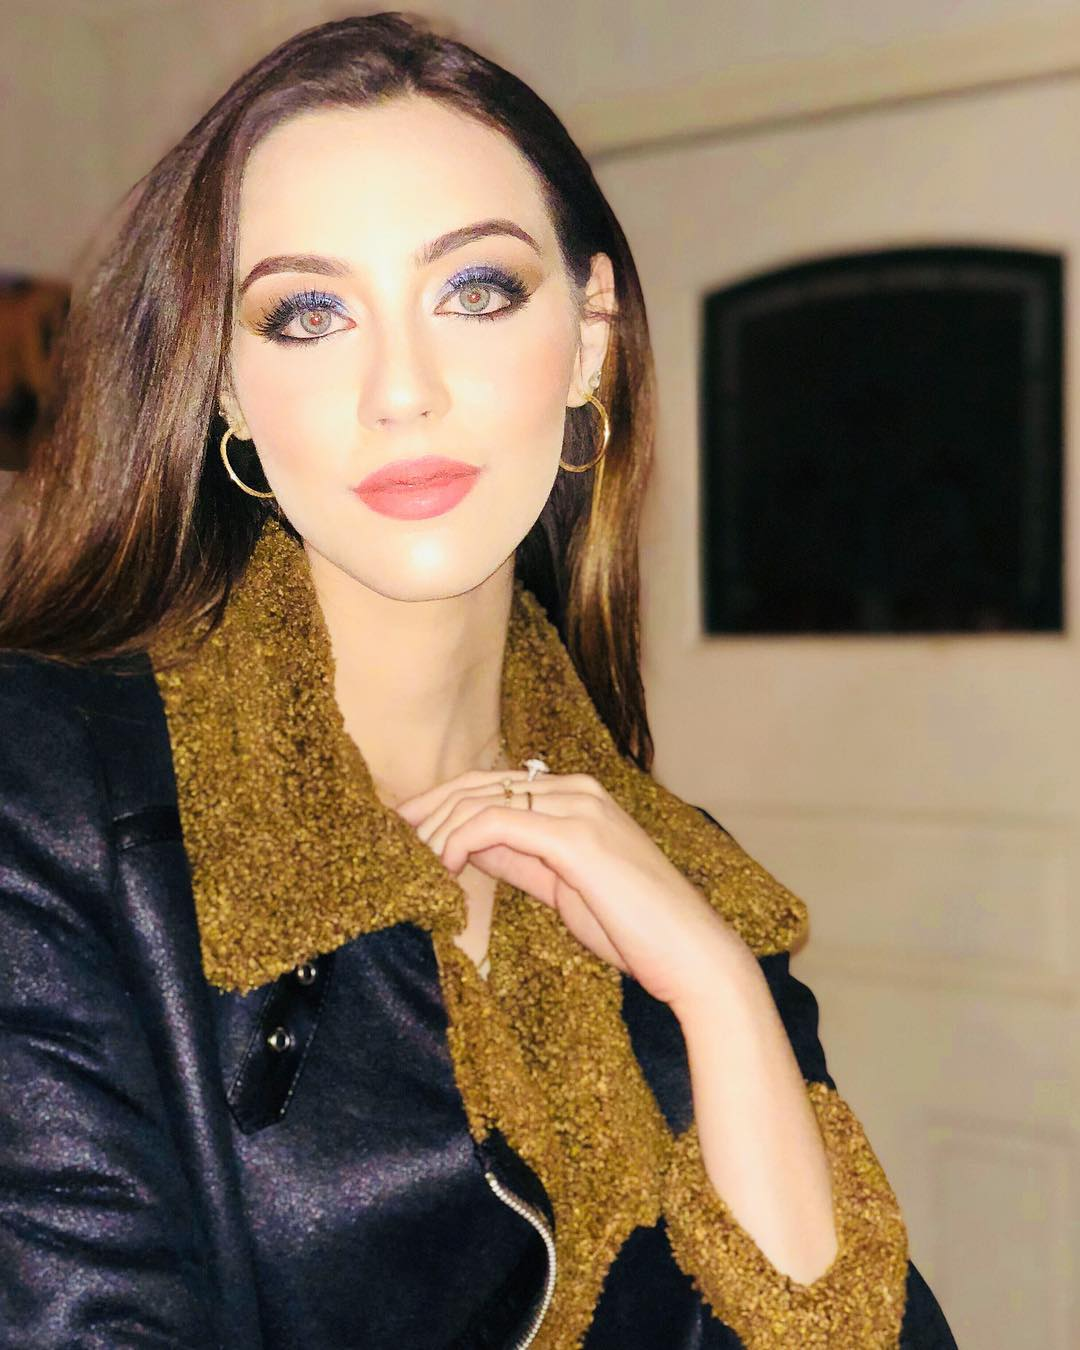 candidatas a miss world australia 2018. final: 31 agosto. - Página 4 H6am2q3b